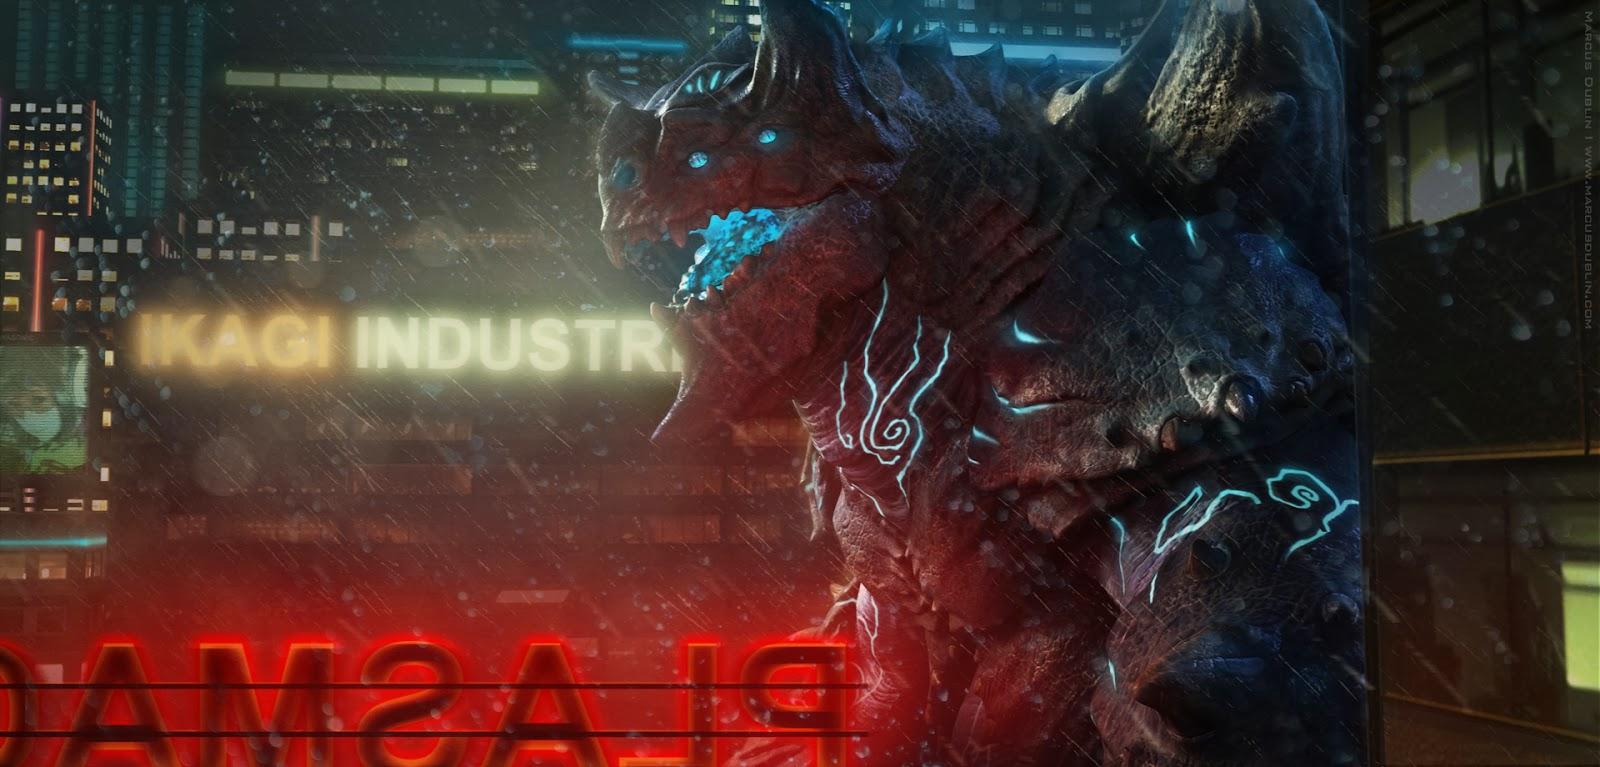 Kaiju Battle: Kaiju Titanus By 3-D Artist Marcus Dublin Pacific Rim Kaiju Category 5